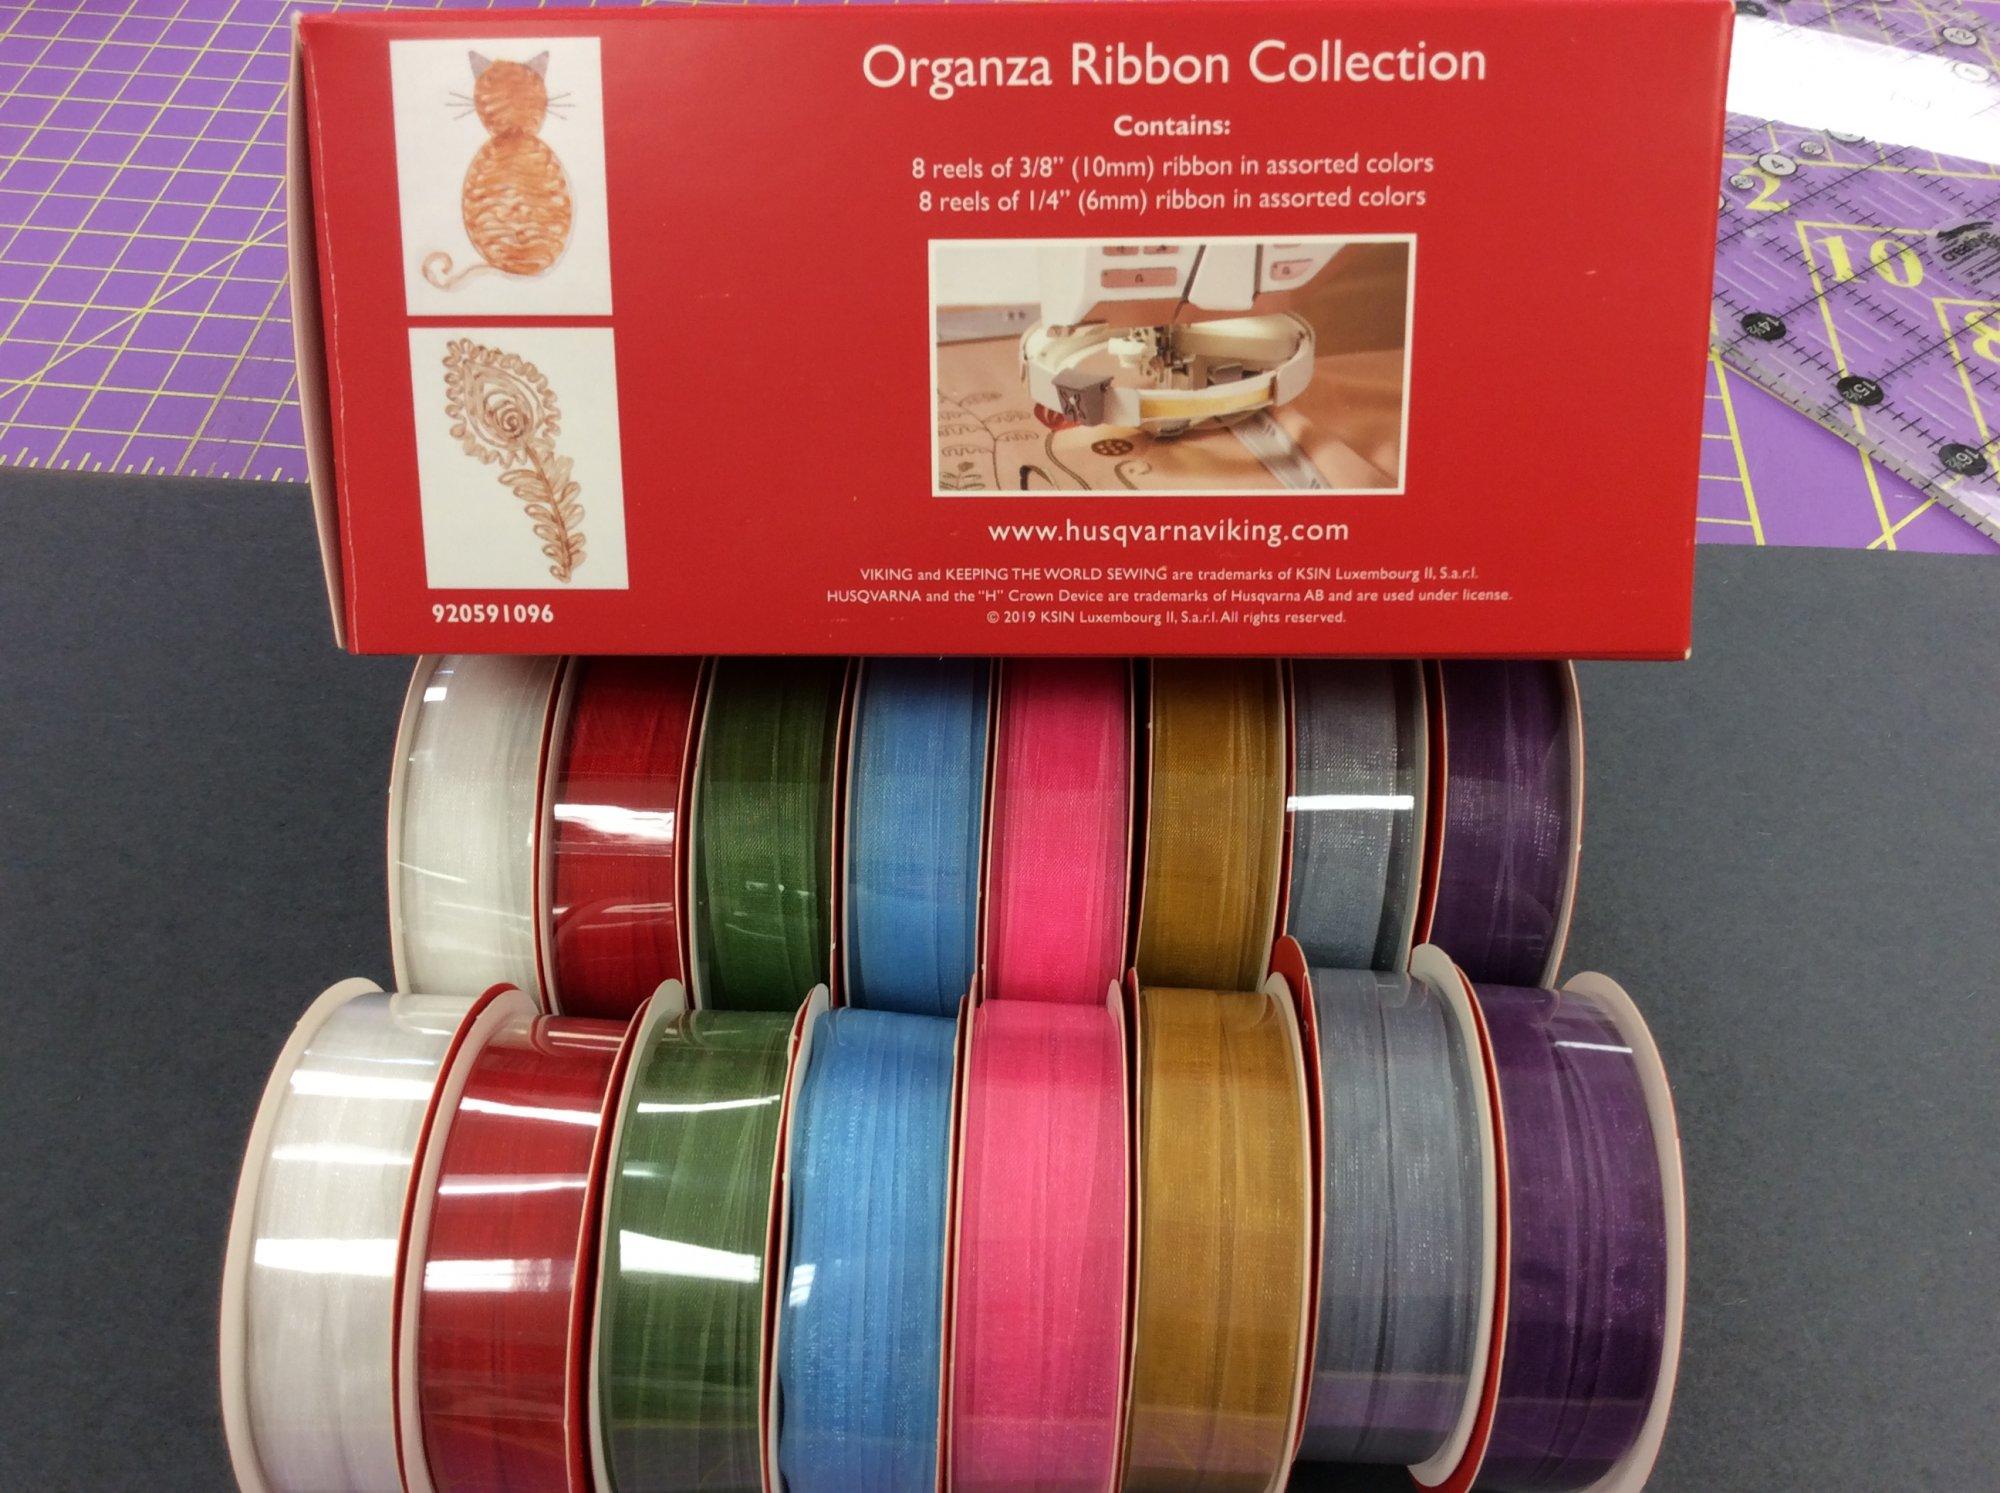 HV Organza Ribbon Collection